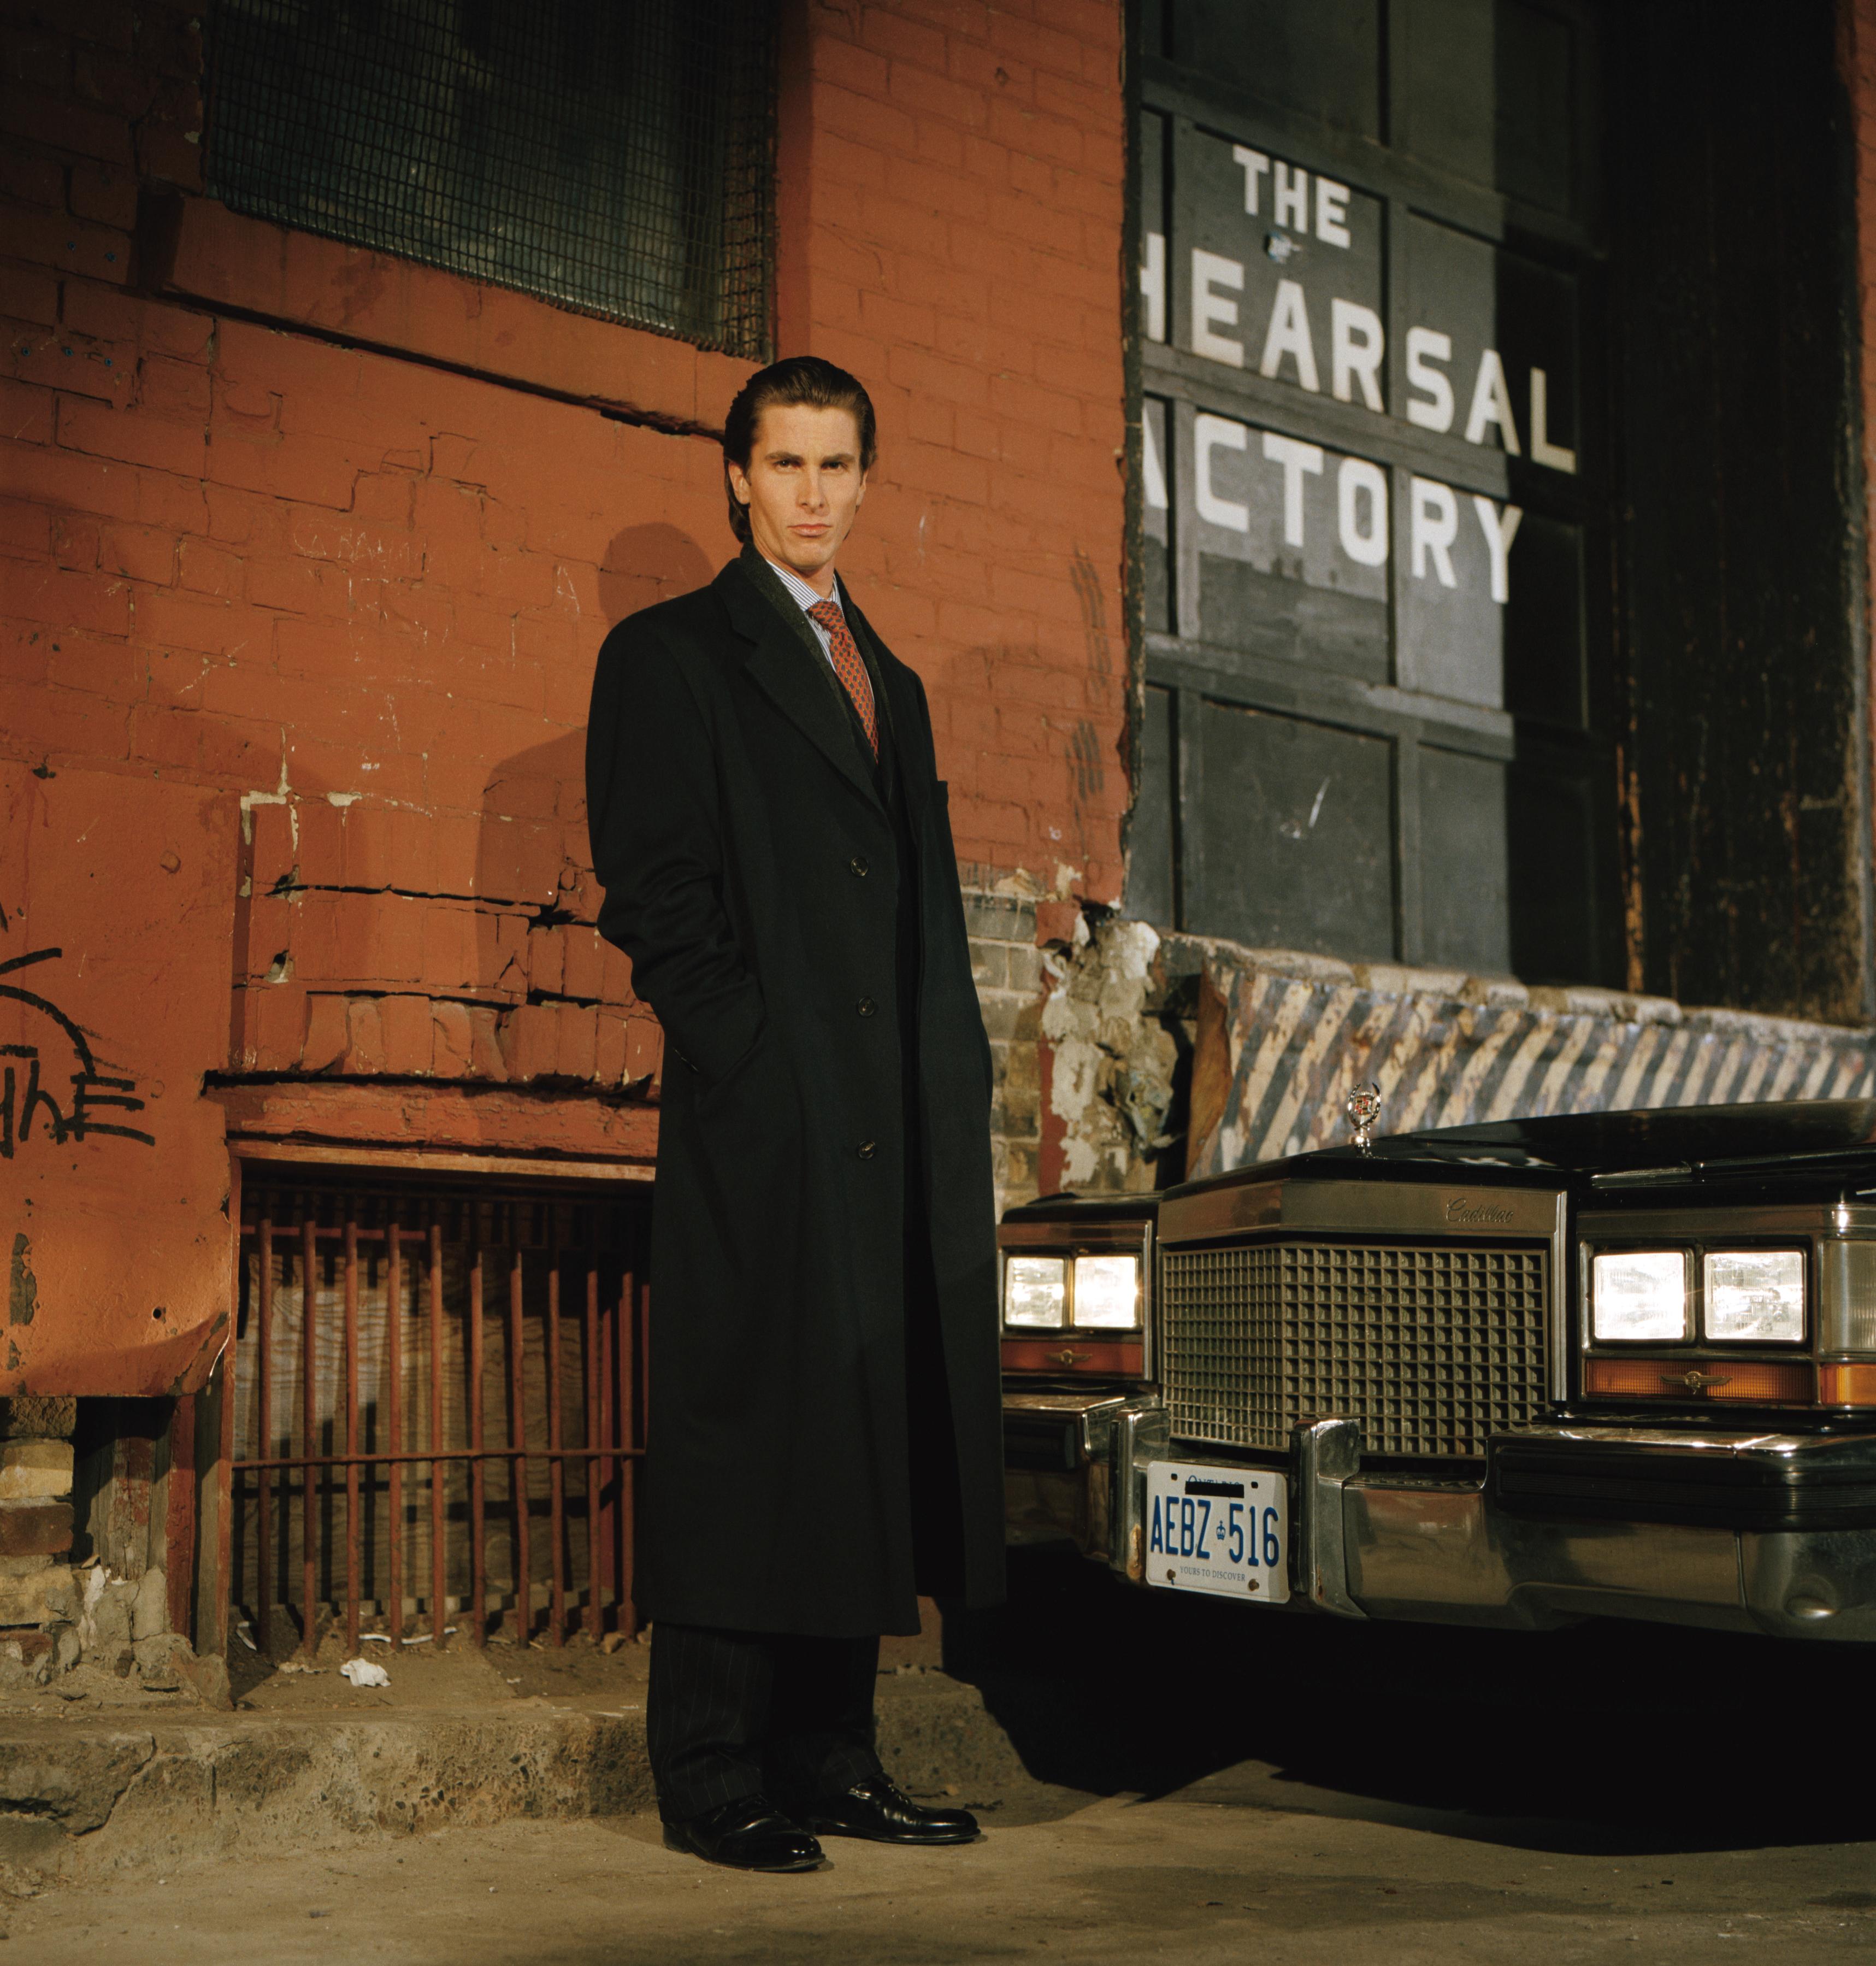 Christian Bale as Patrick Bateman on set of American Psycho